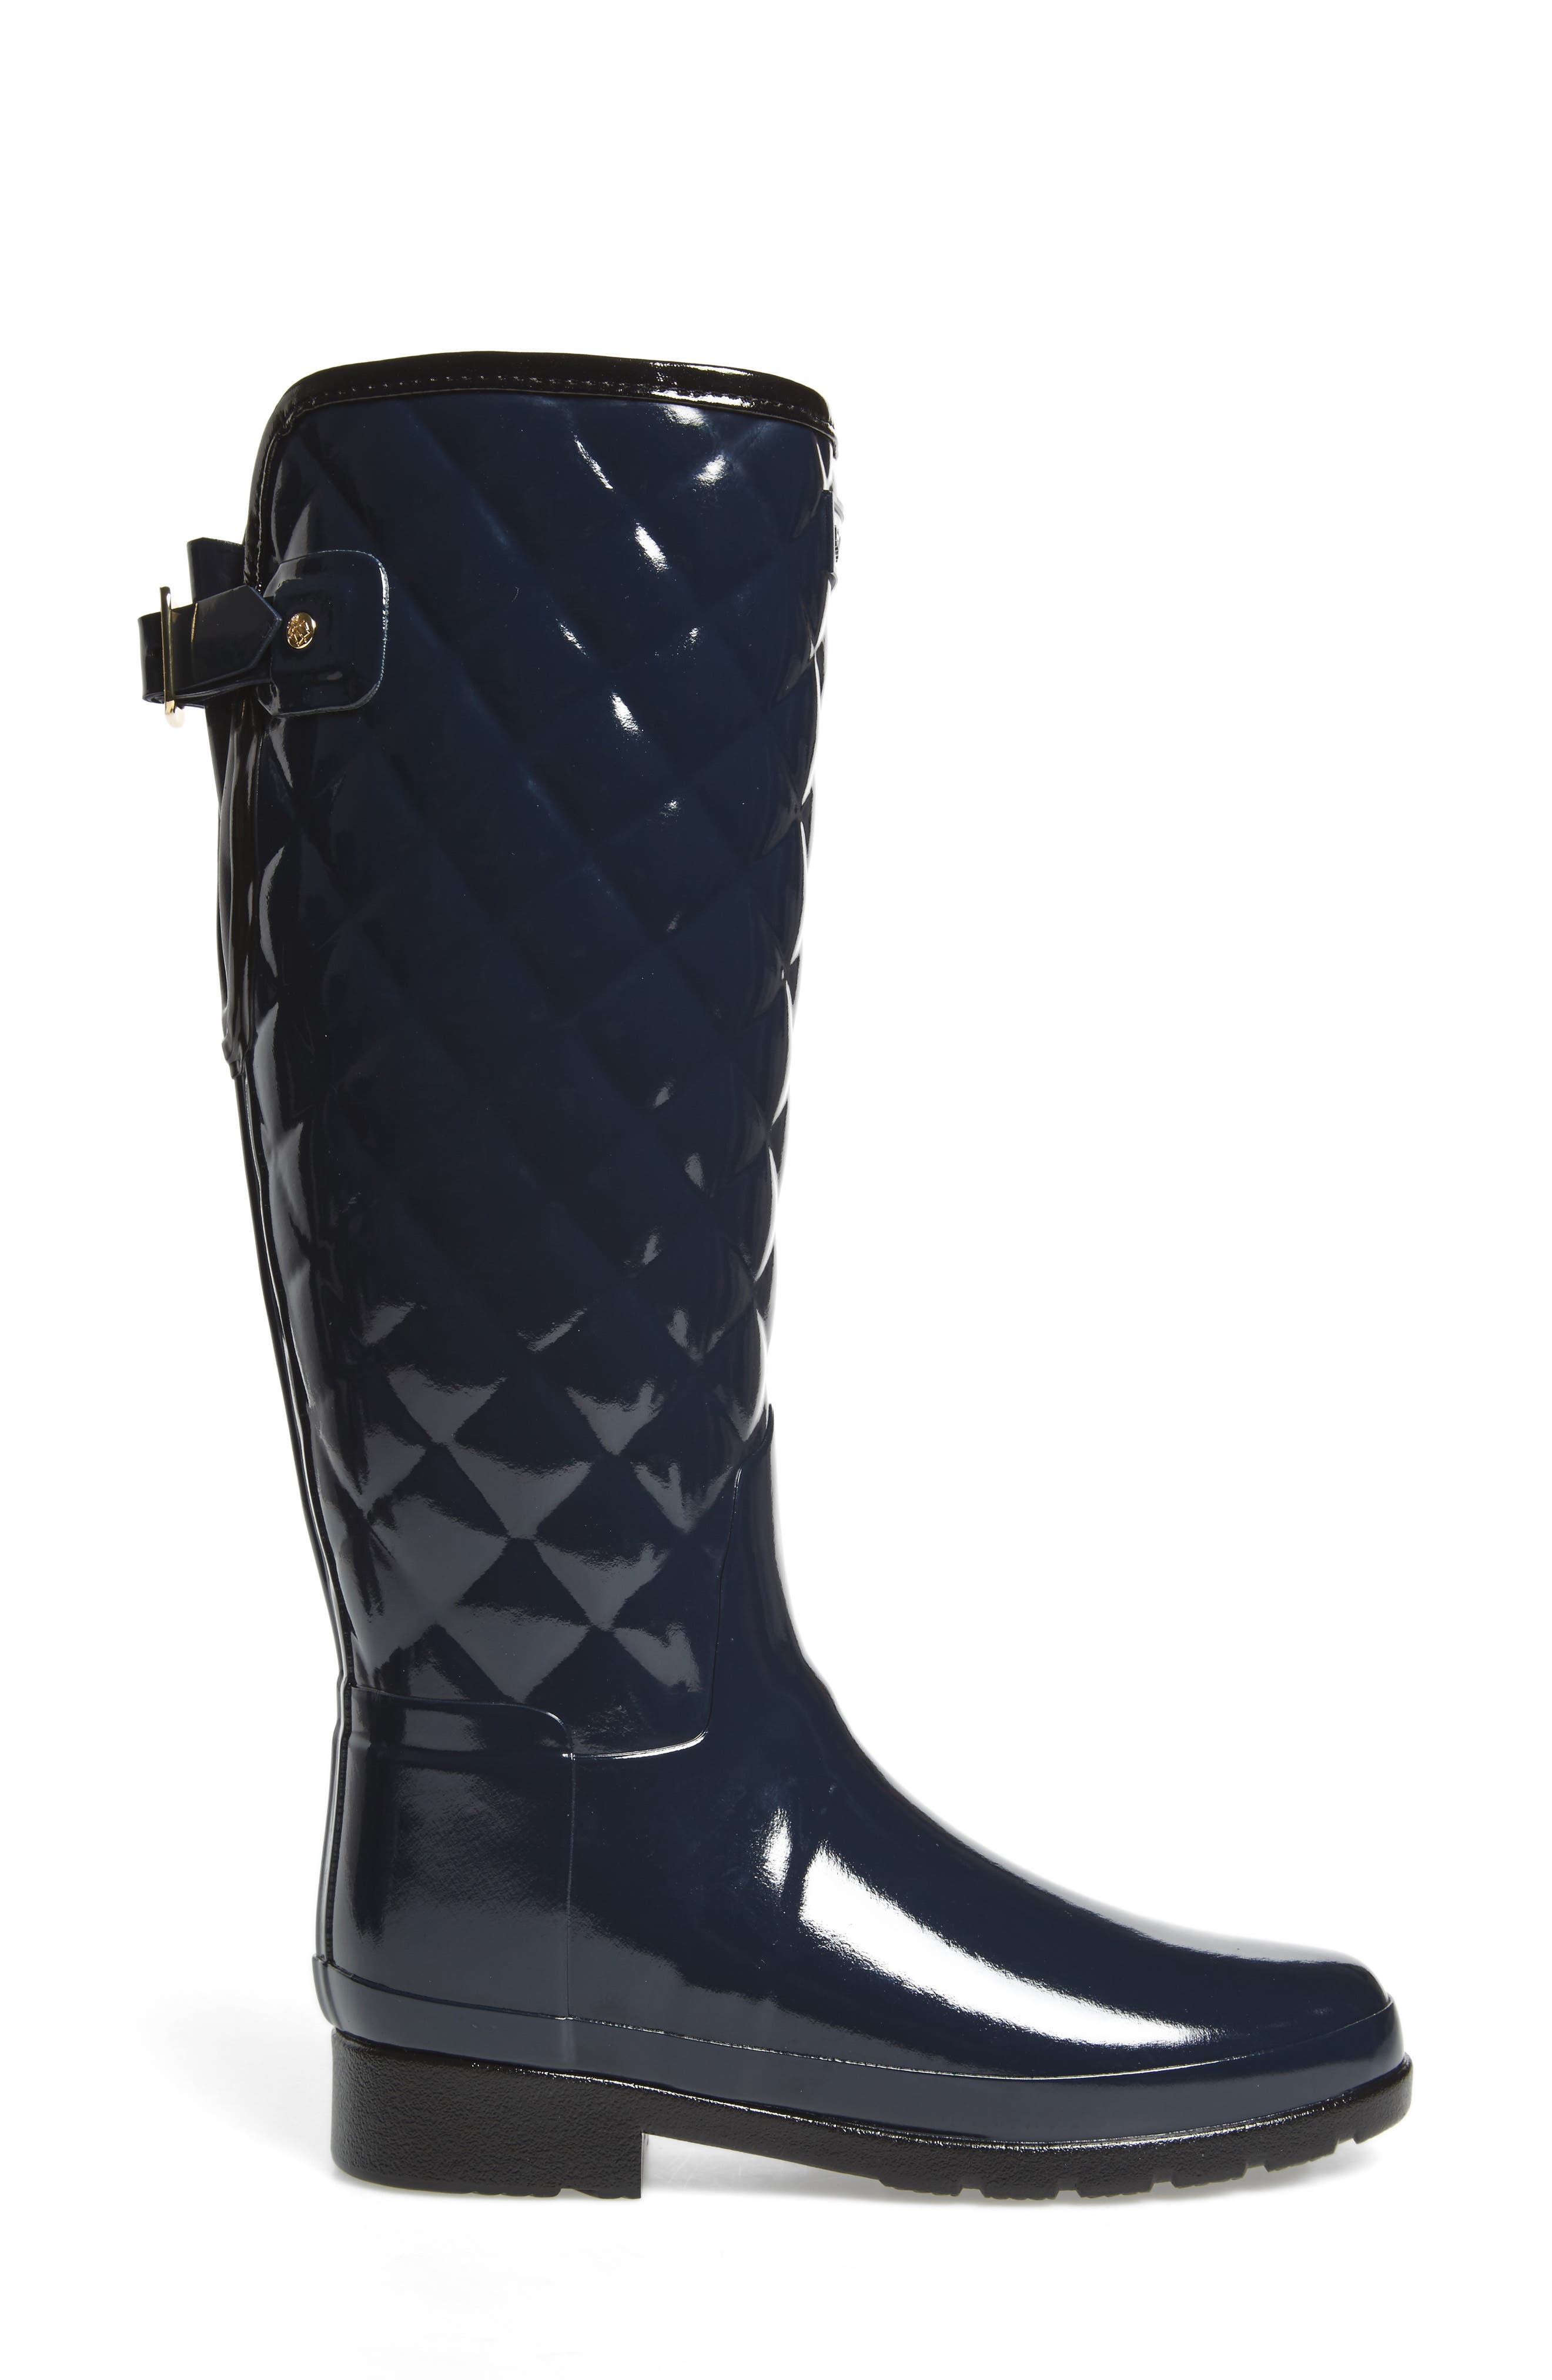 Alternate Image 3  - Hunter Original Refined High Gloss Quilted Rain Boot (Women)